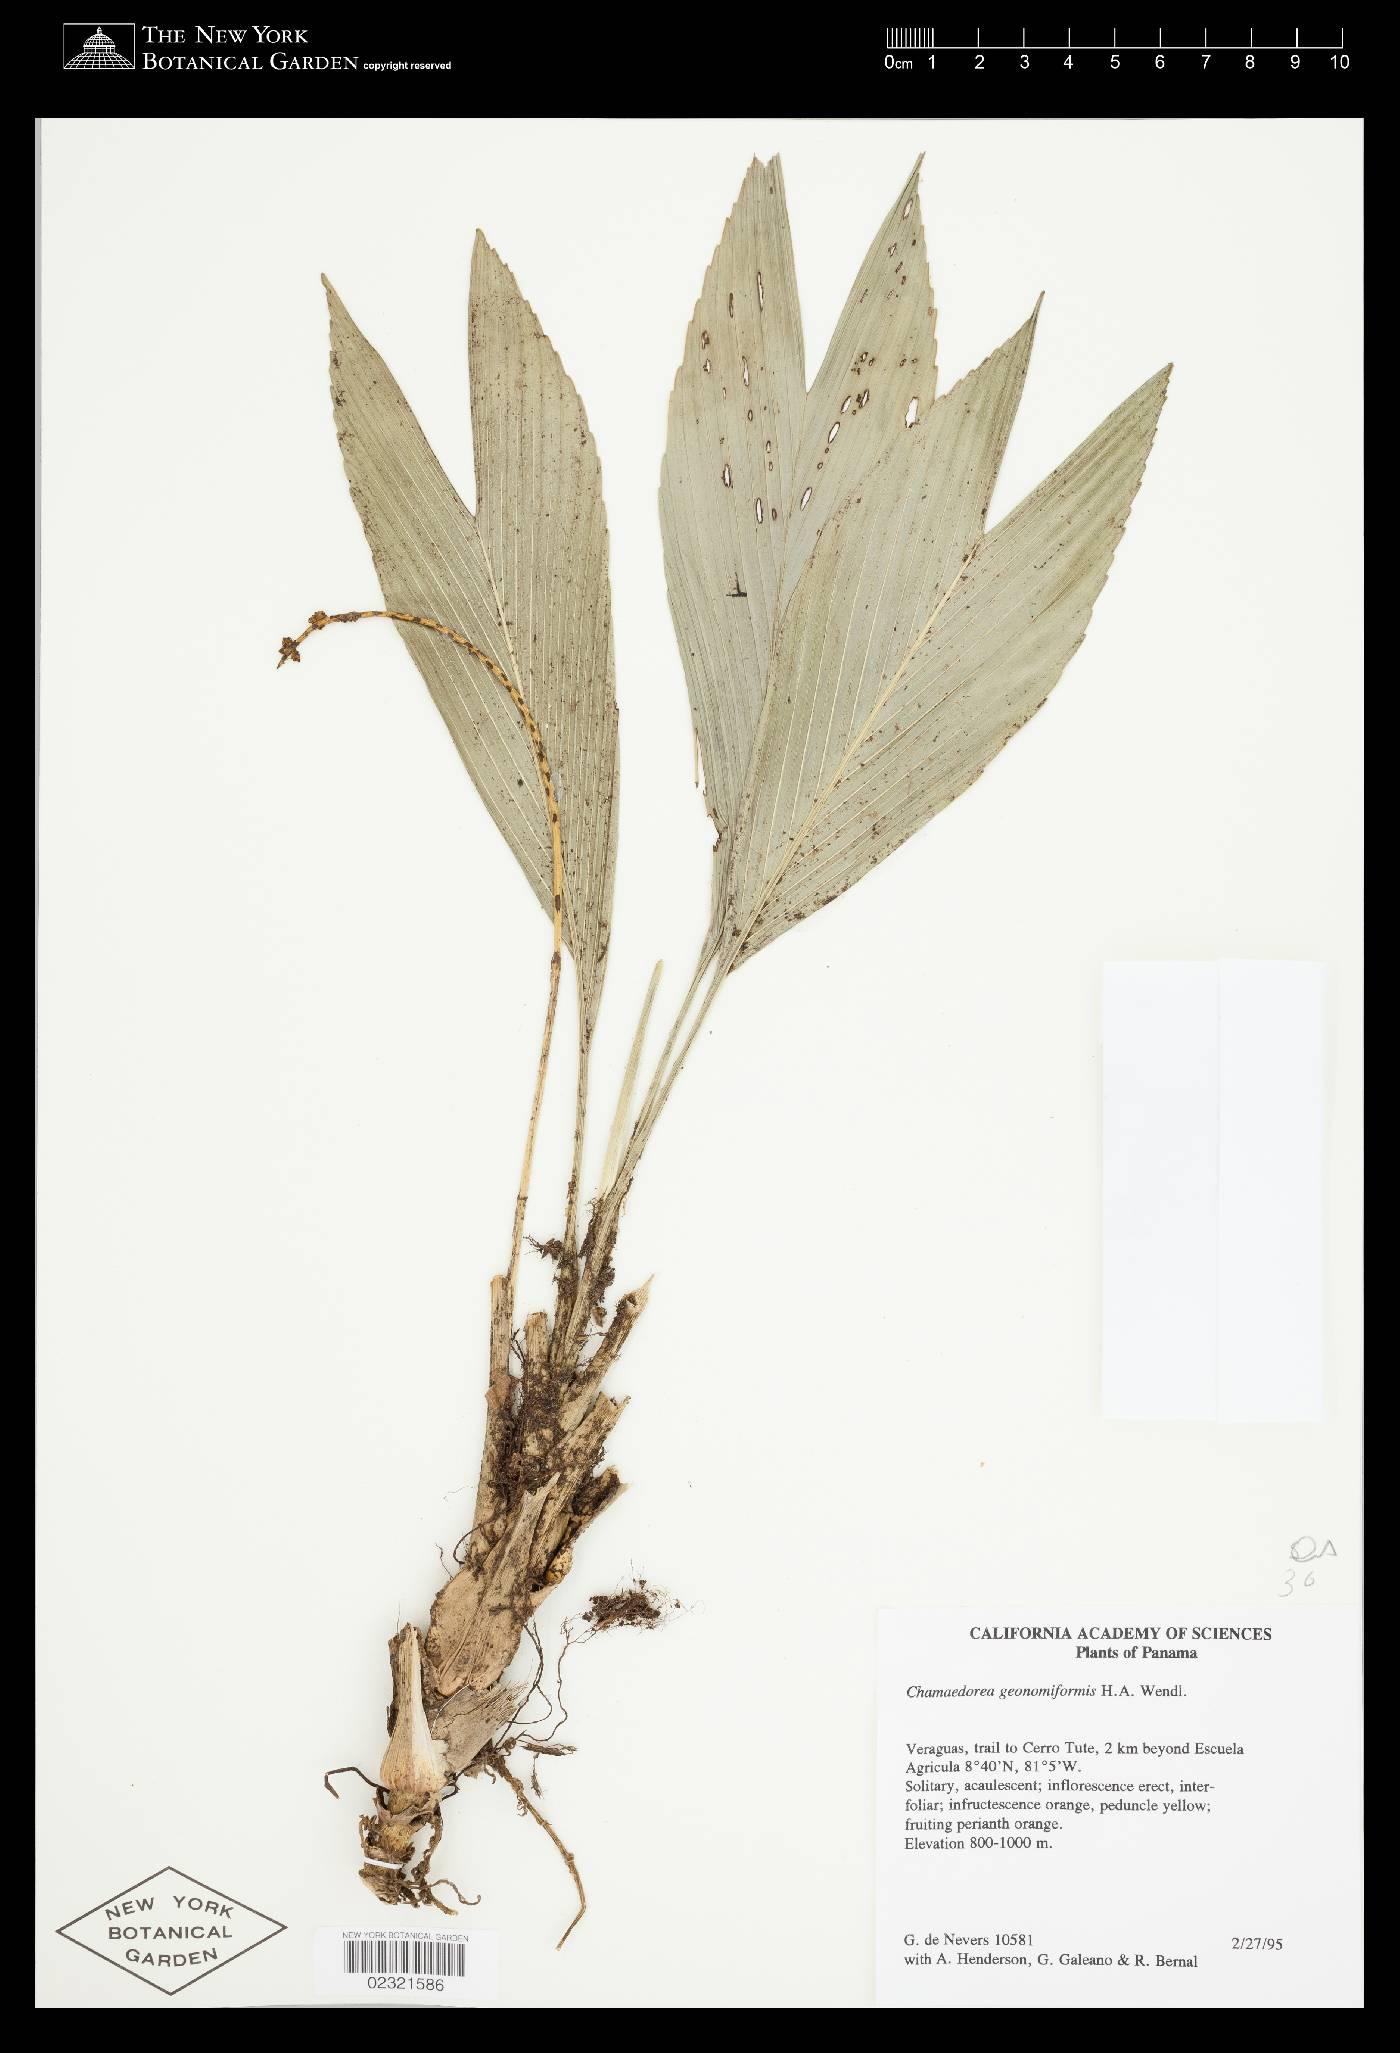 Chamaedorea geonomiformis image